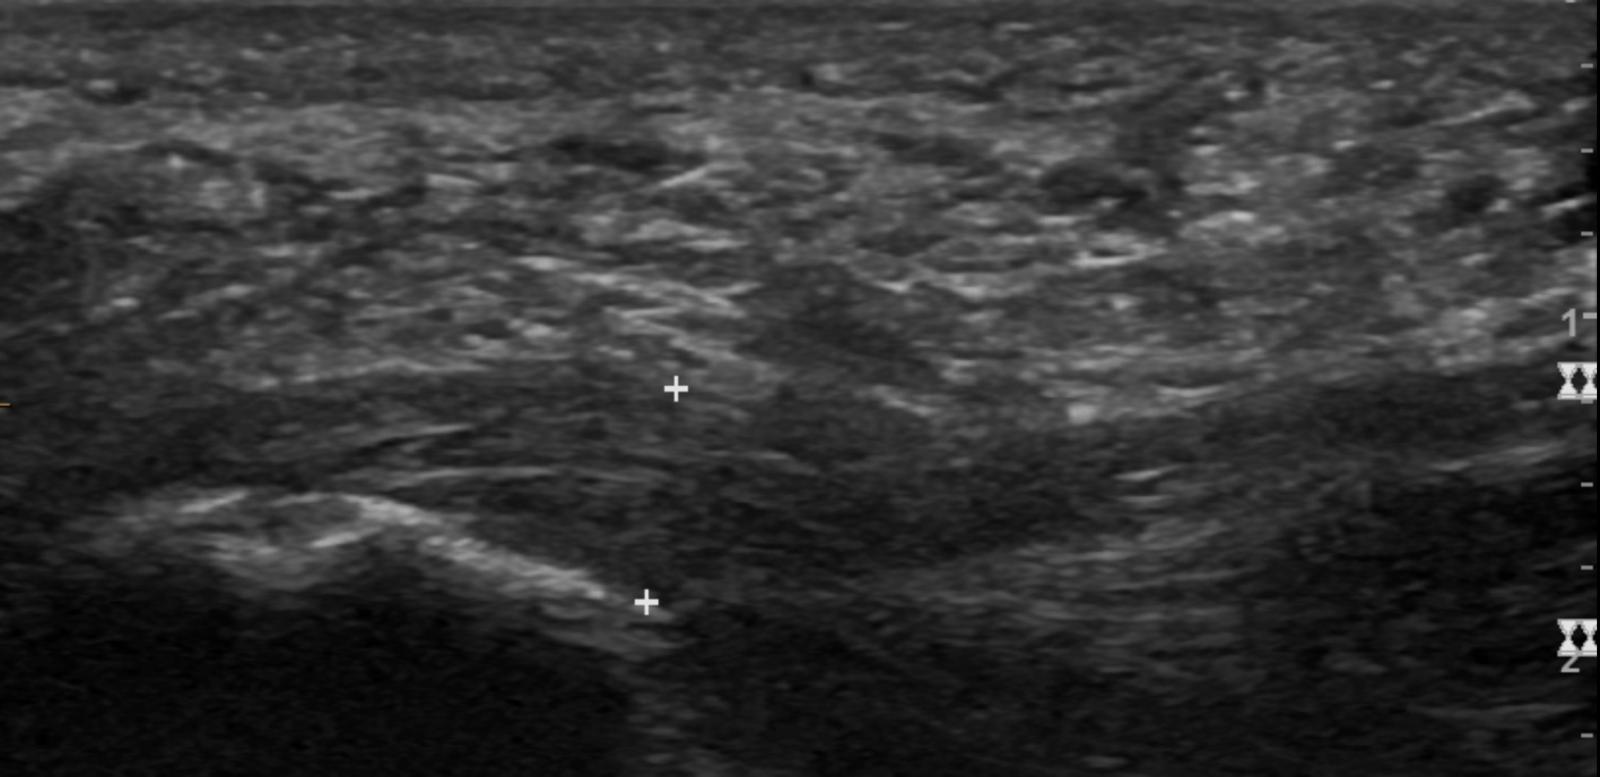 Thickened plantar fascia